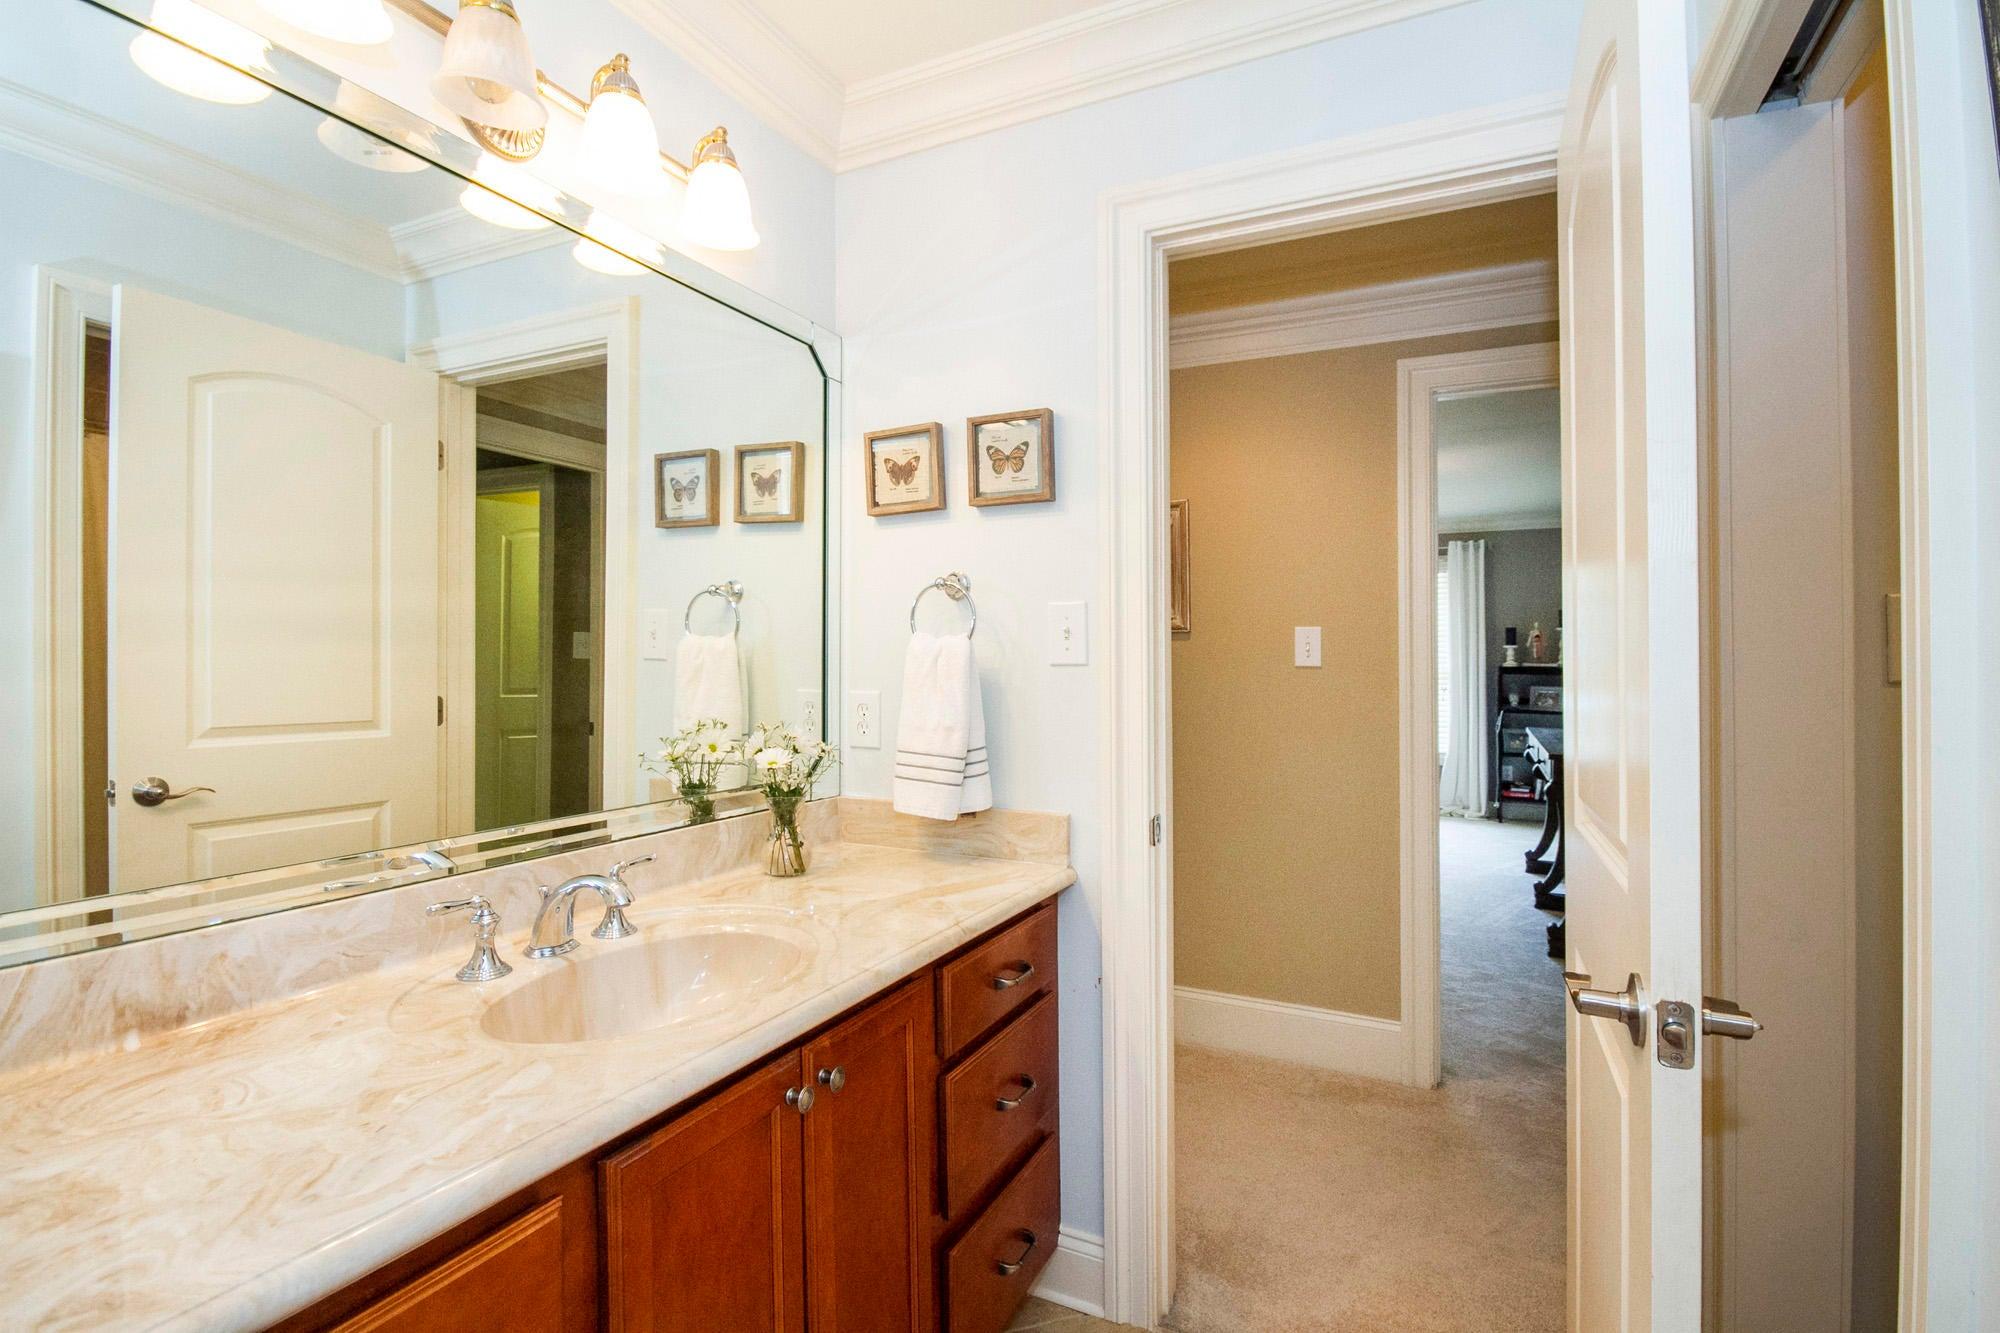 Bedroom 3/Hall Bath